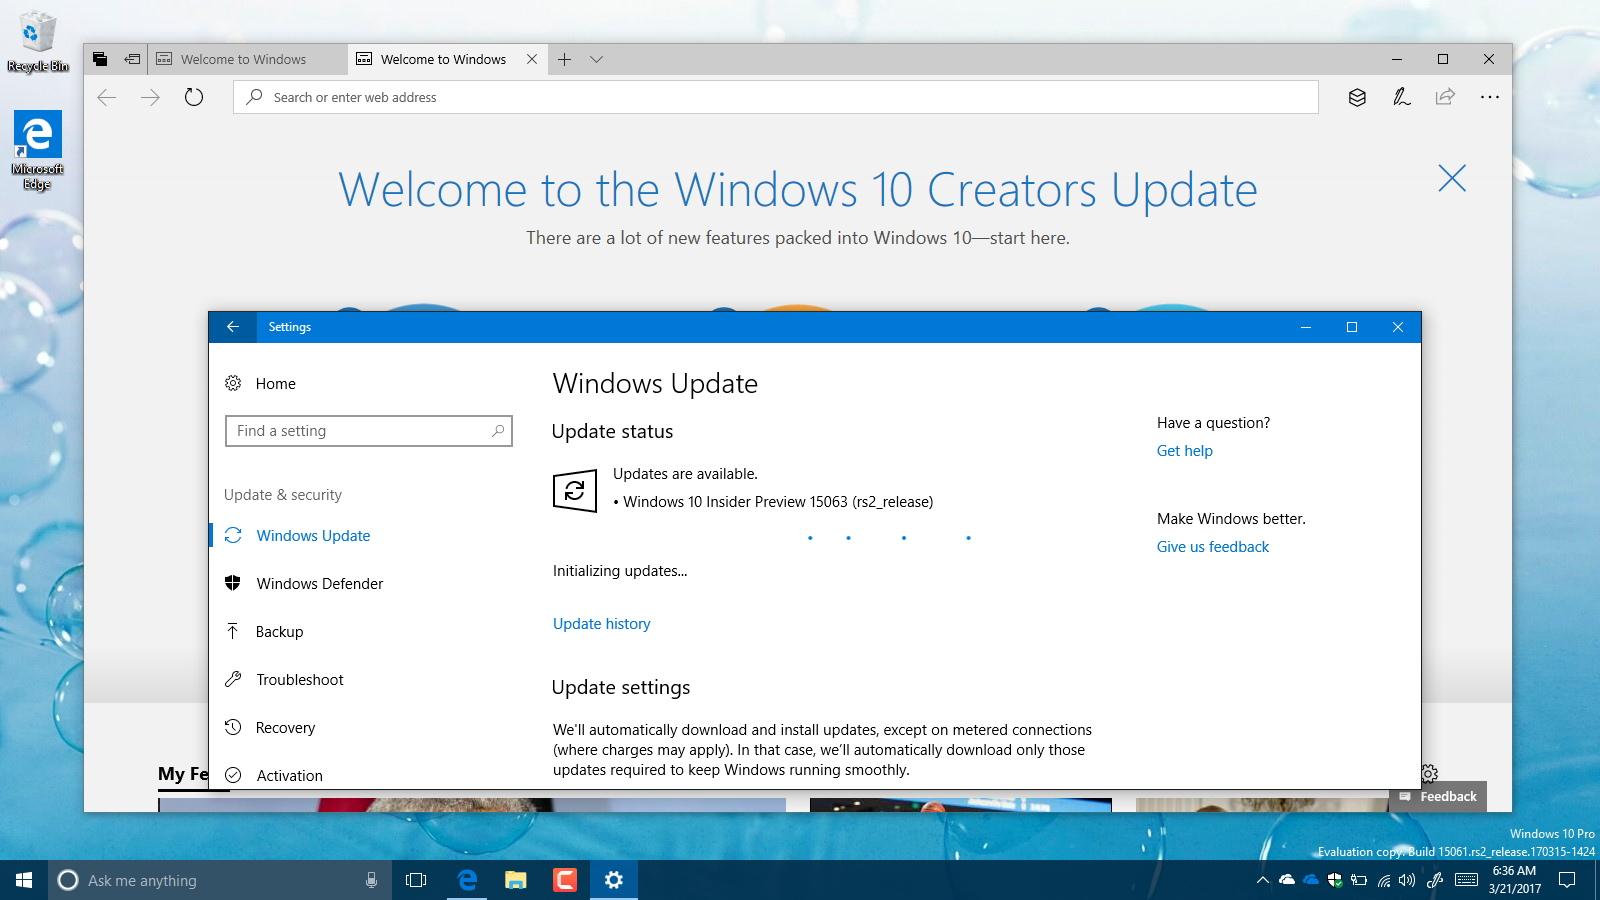 Windows 10 build 15063